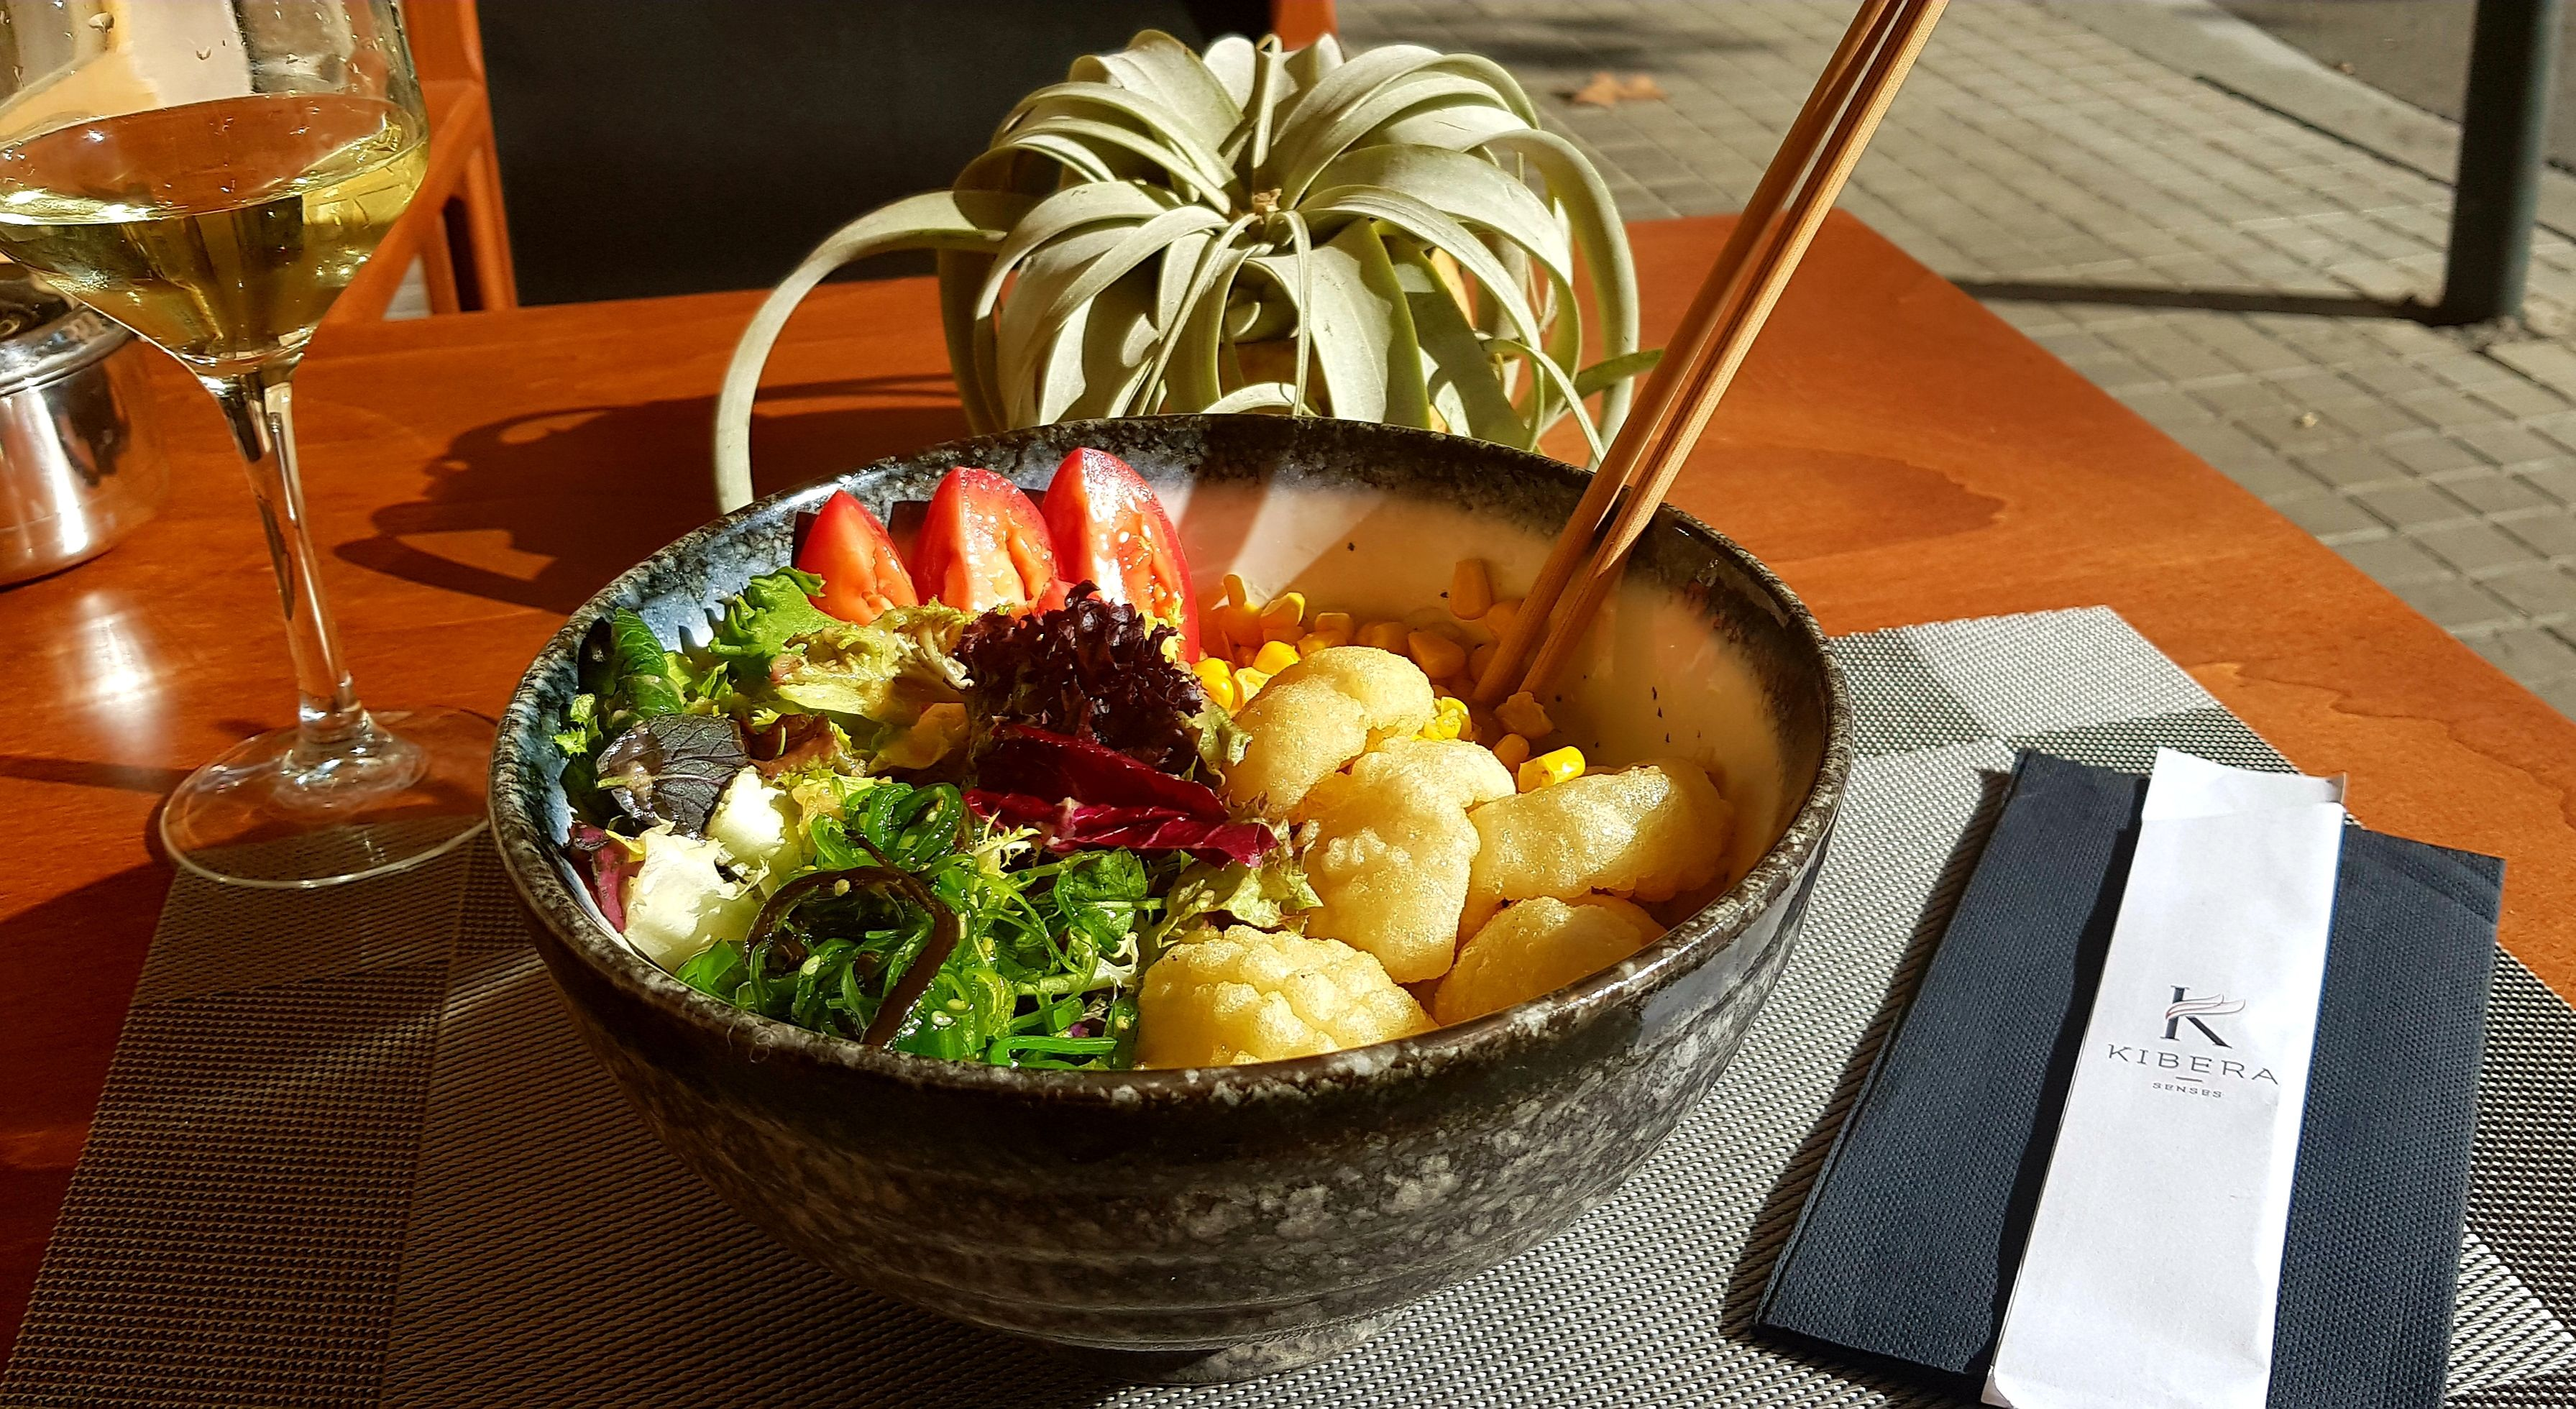 Foto 16 de Japanese cuisine en  | Kibera Senses